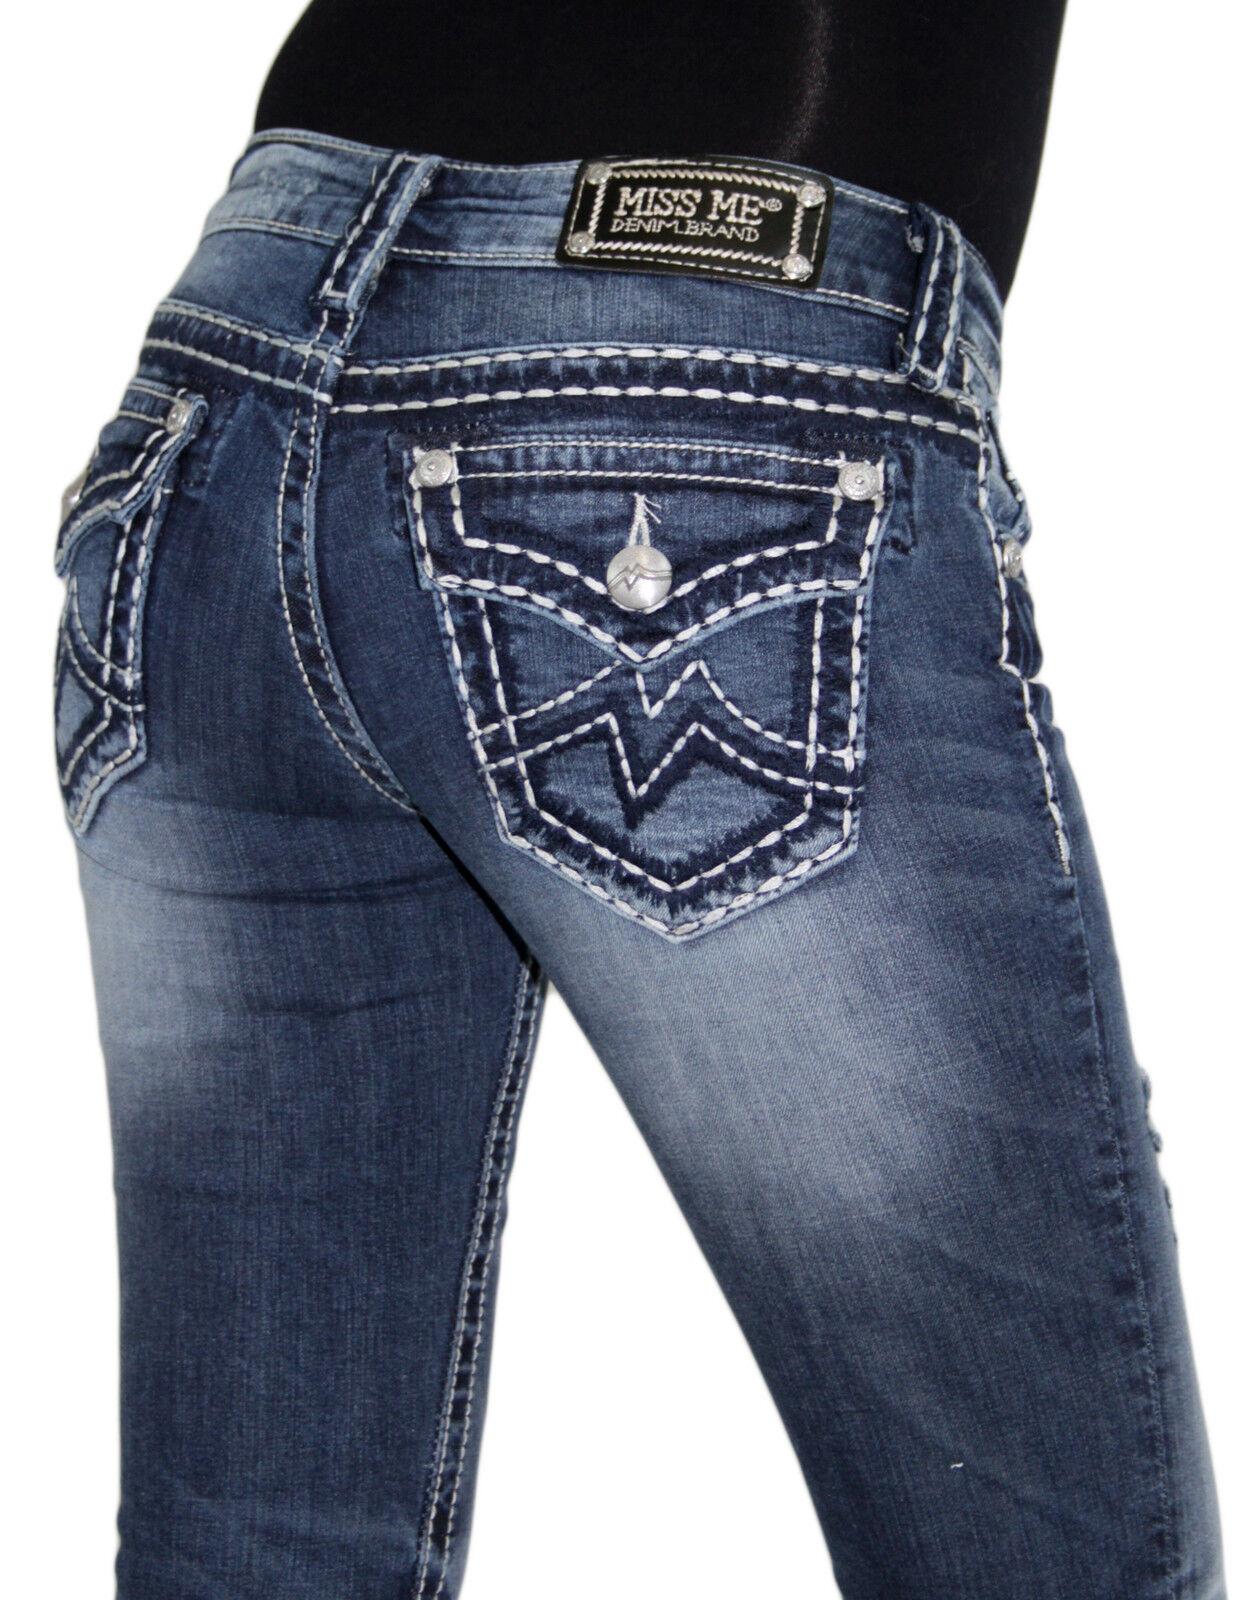 9fd4ce6a2d54 NWT MISS ME Women's M Big Stitch Distressed bluee MED 144 Boot Cut Jeans